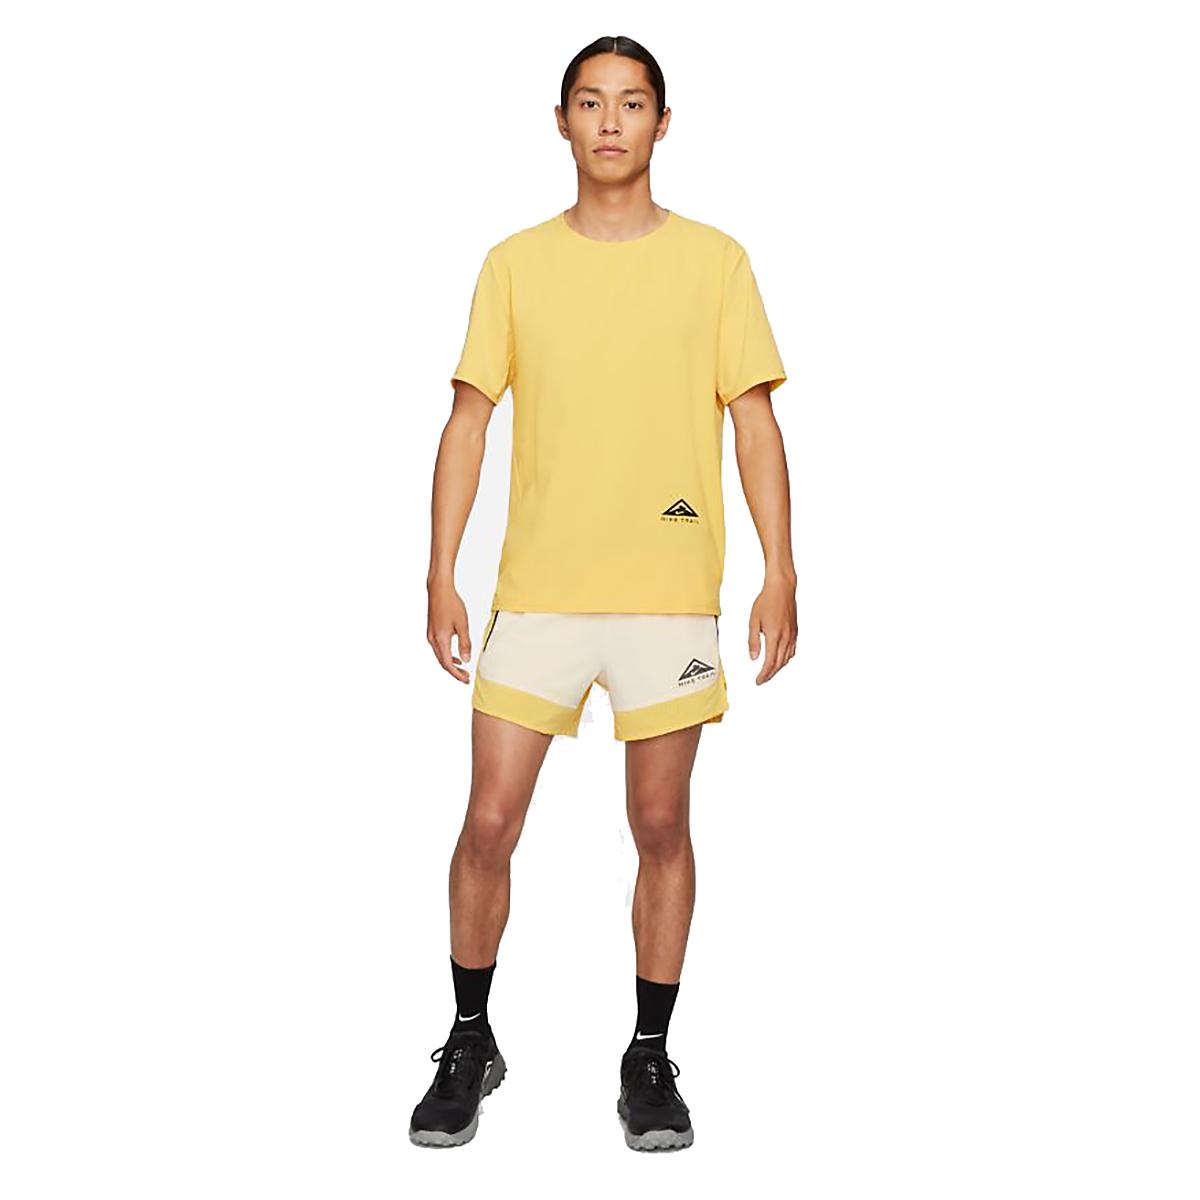 Men's Nike Dri-FIT Flex Stride Trail Shorts - Color: Solar Flare/Beach/Black - Size: S, Solar Flare/Beach/Black, large, image 6